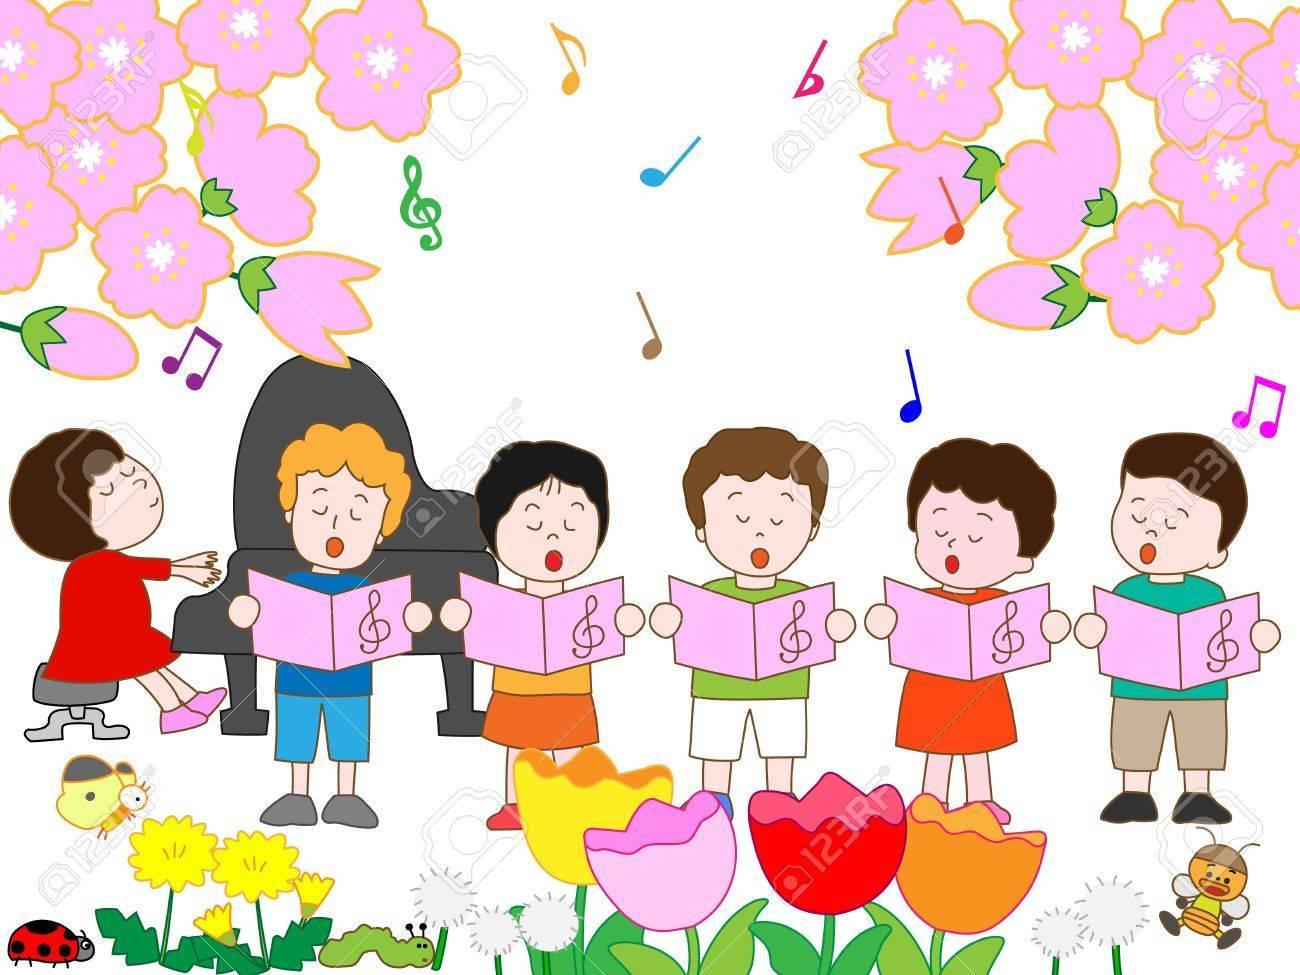 Spring concert clipart 4 » Clipart Portal.